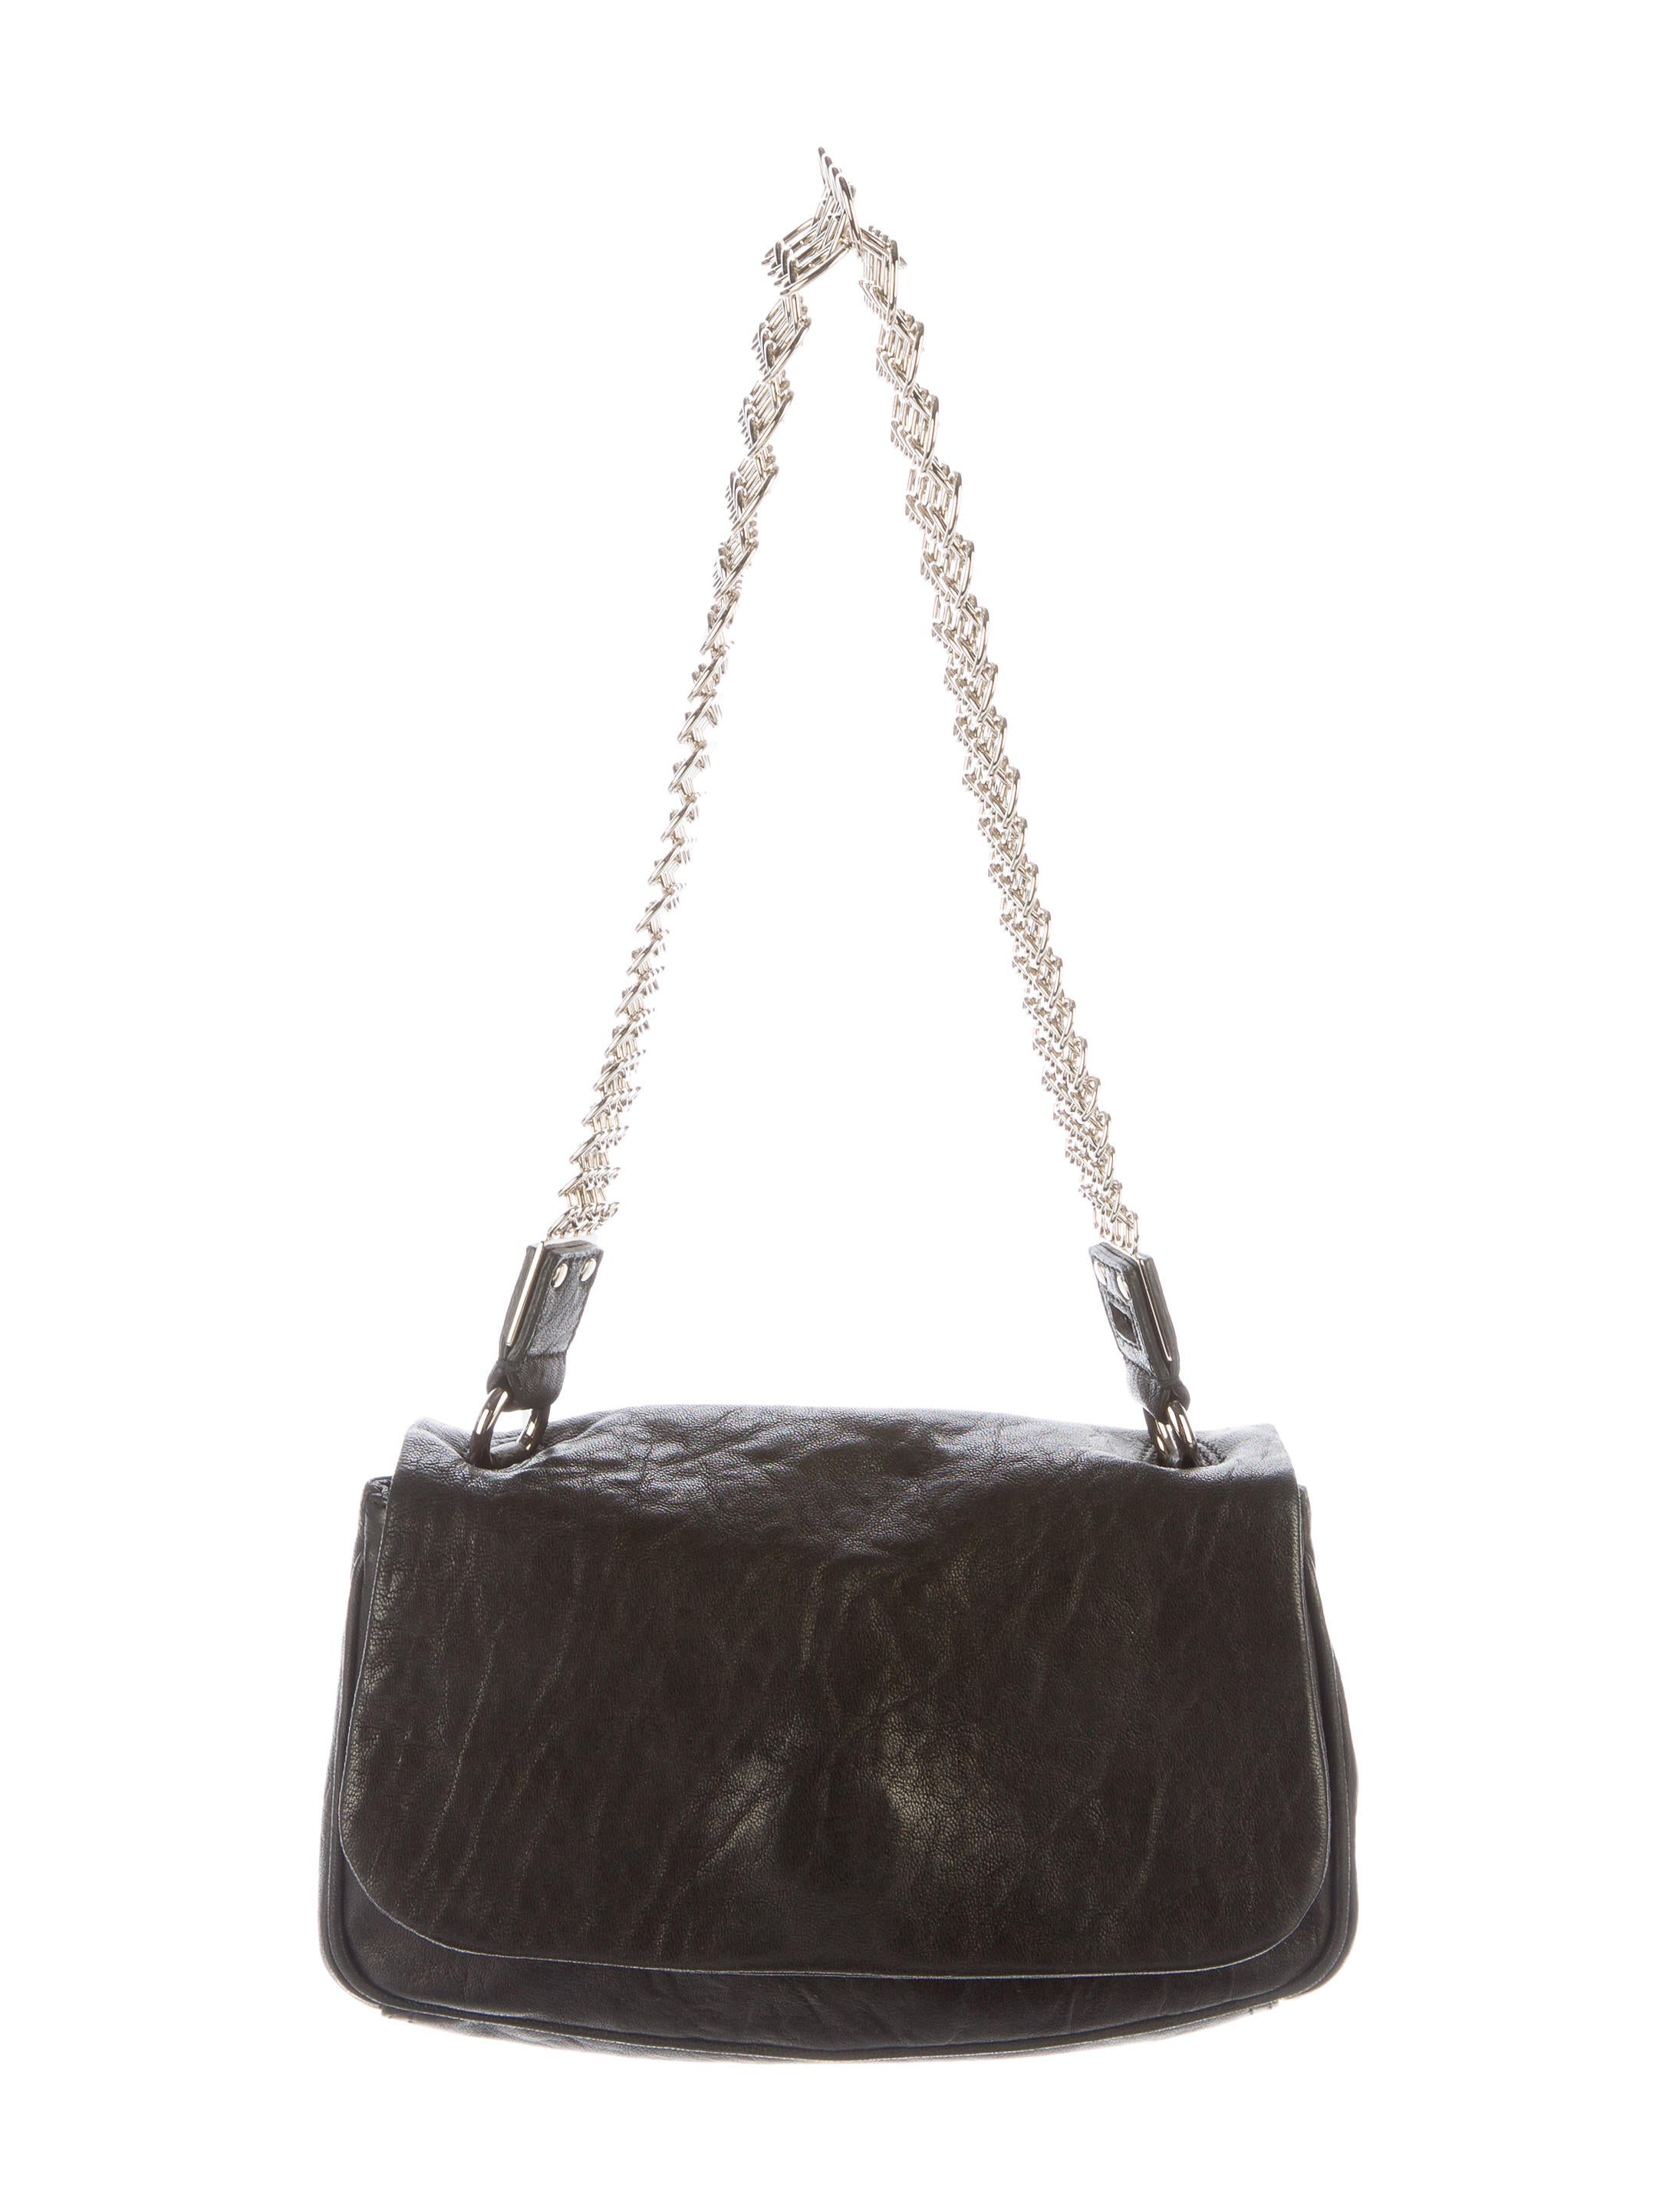 Yves Saint Laurent Leather Chain Shoulder Bag